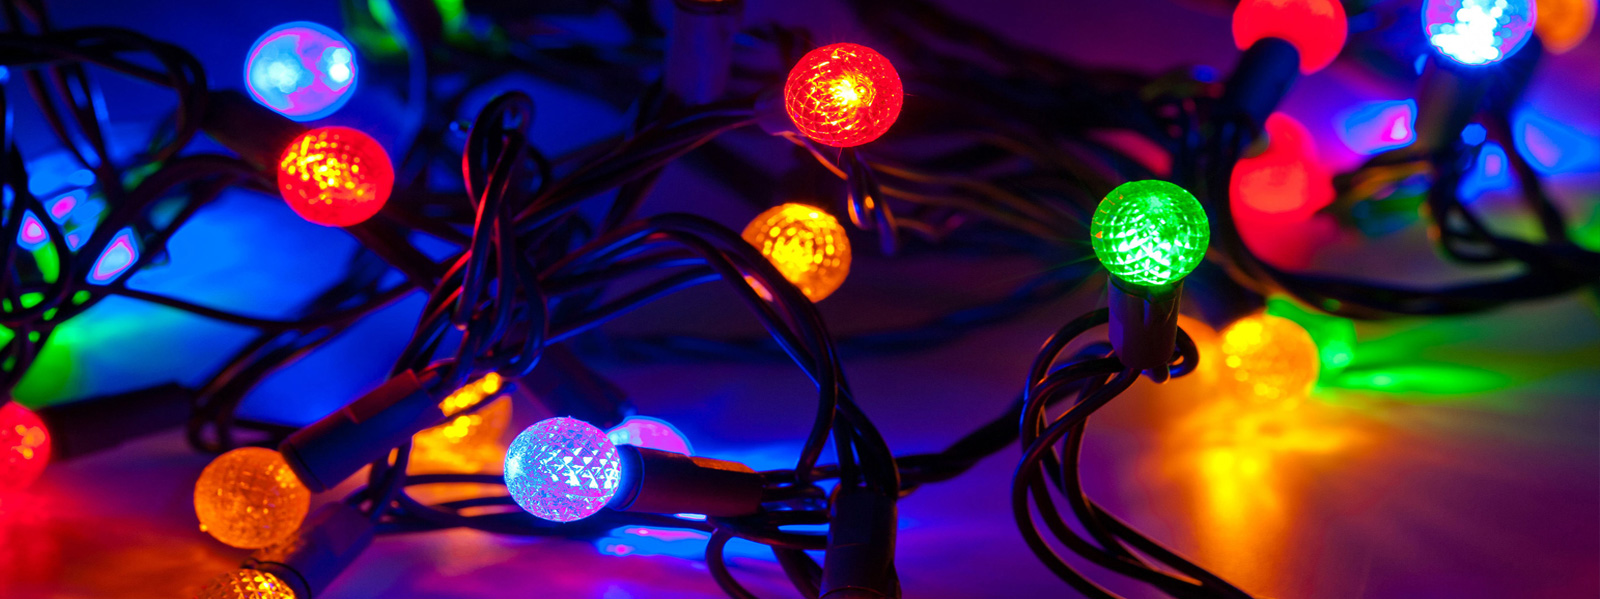 Hd Design String Lights : Solar Party Lights Australia C9 U0026 E17 Replacement Bulbs Replacement String Light Bulbs ...